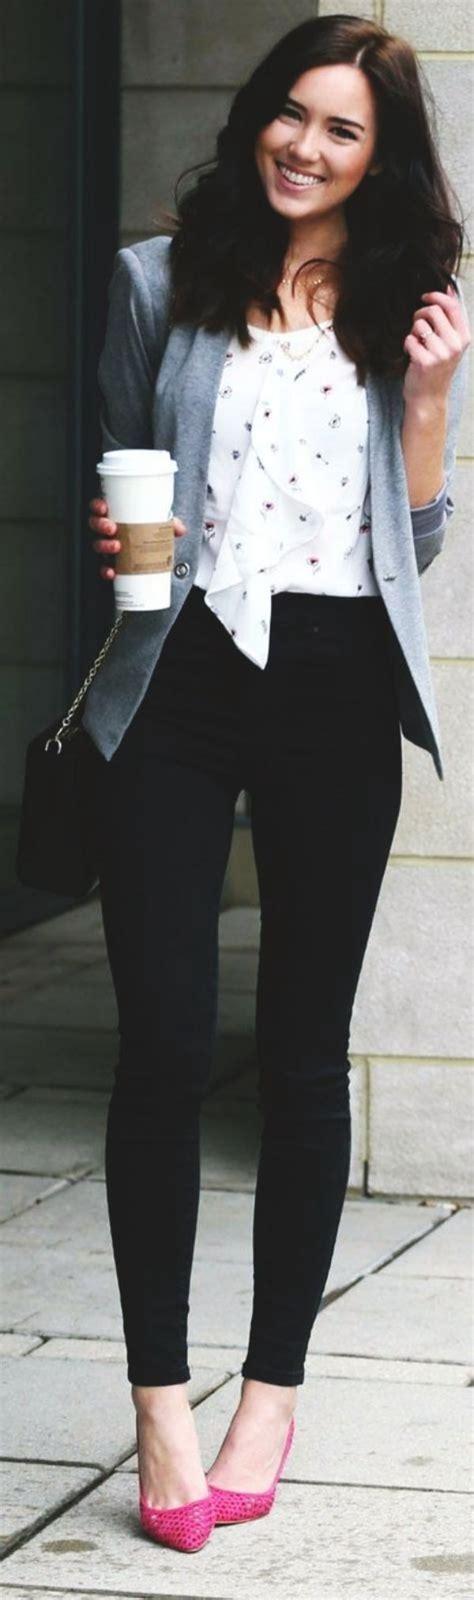 ausgewogen casual arbeit outfits fuer frauen business